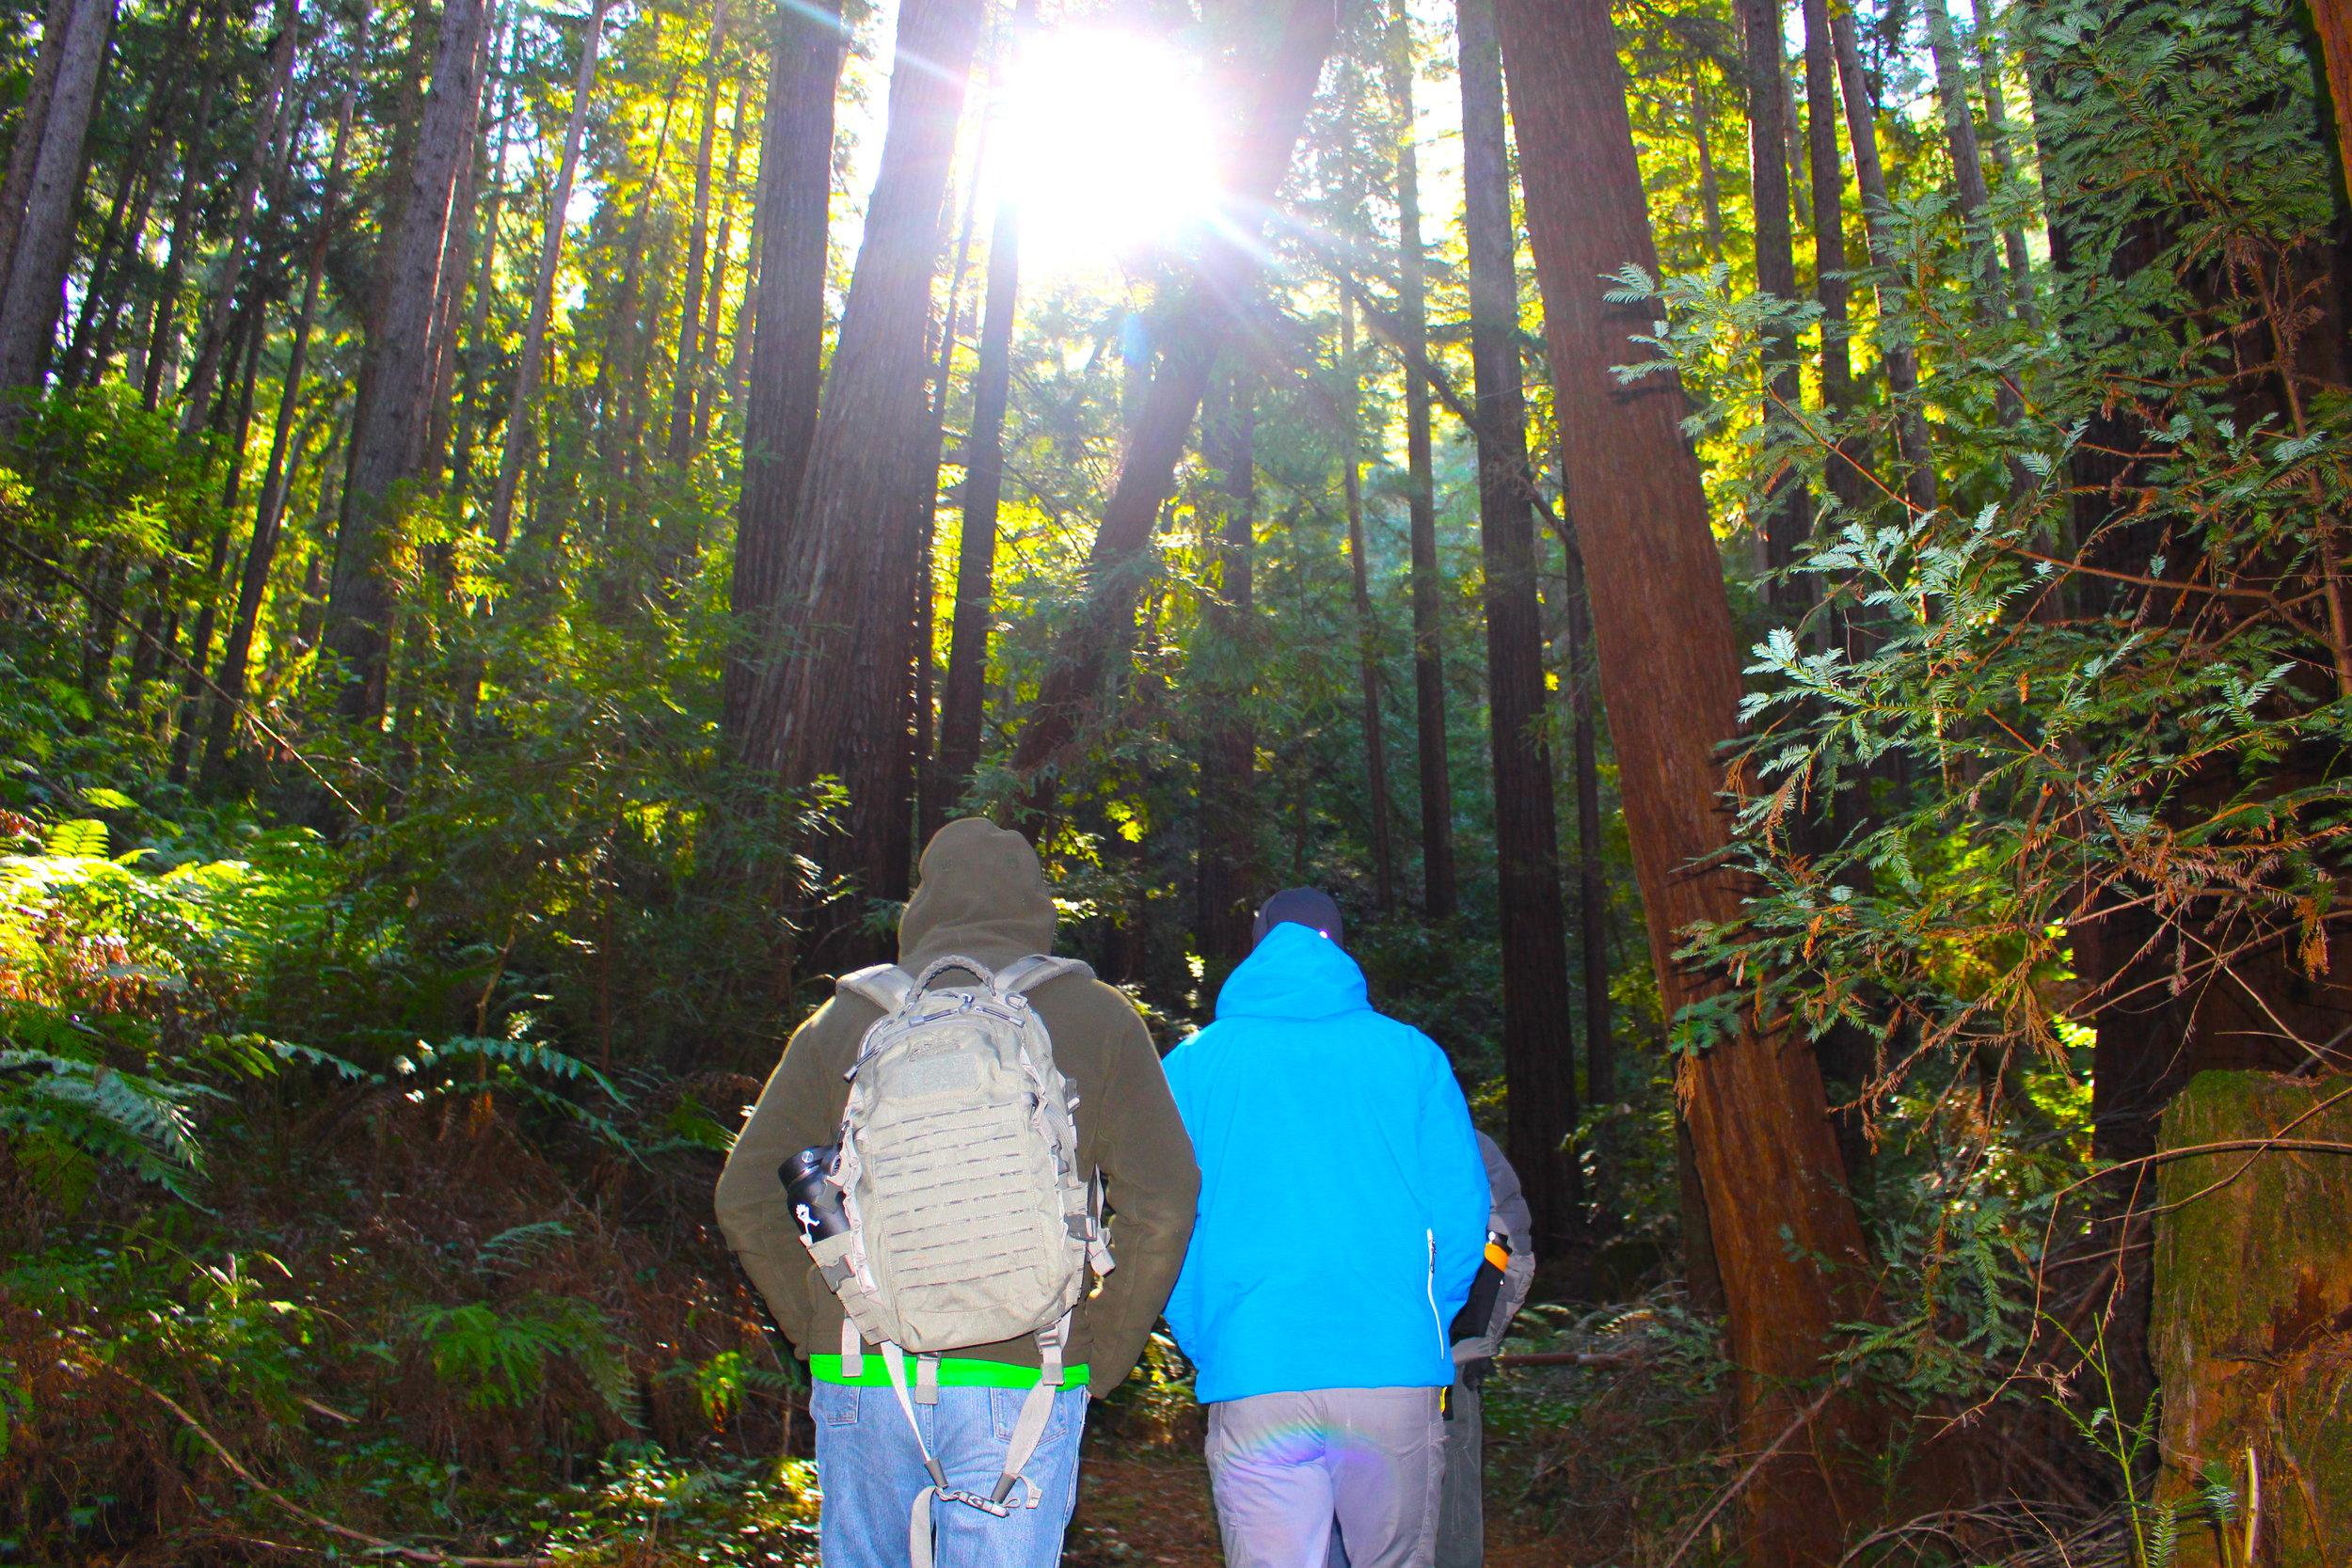 HQ bill eric joe pat Land excursion STG 001 survival training outdoors redwoods IMG_3584 (2).JPG